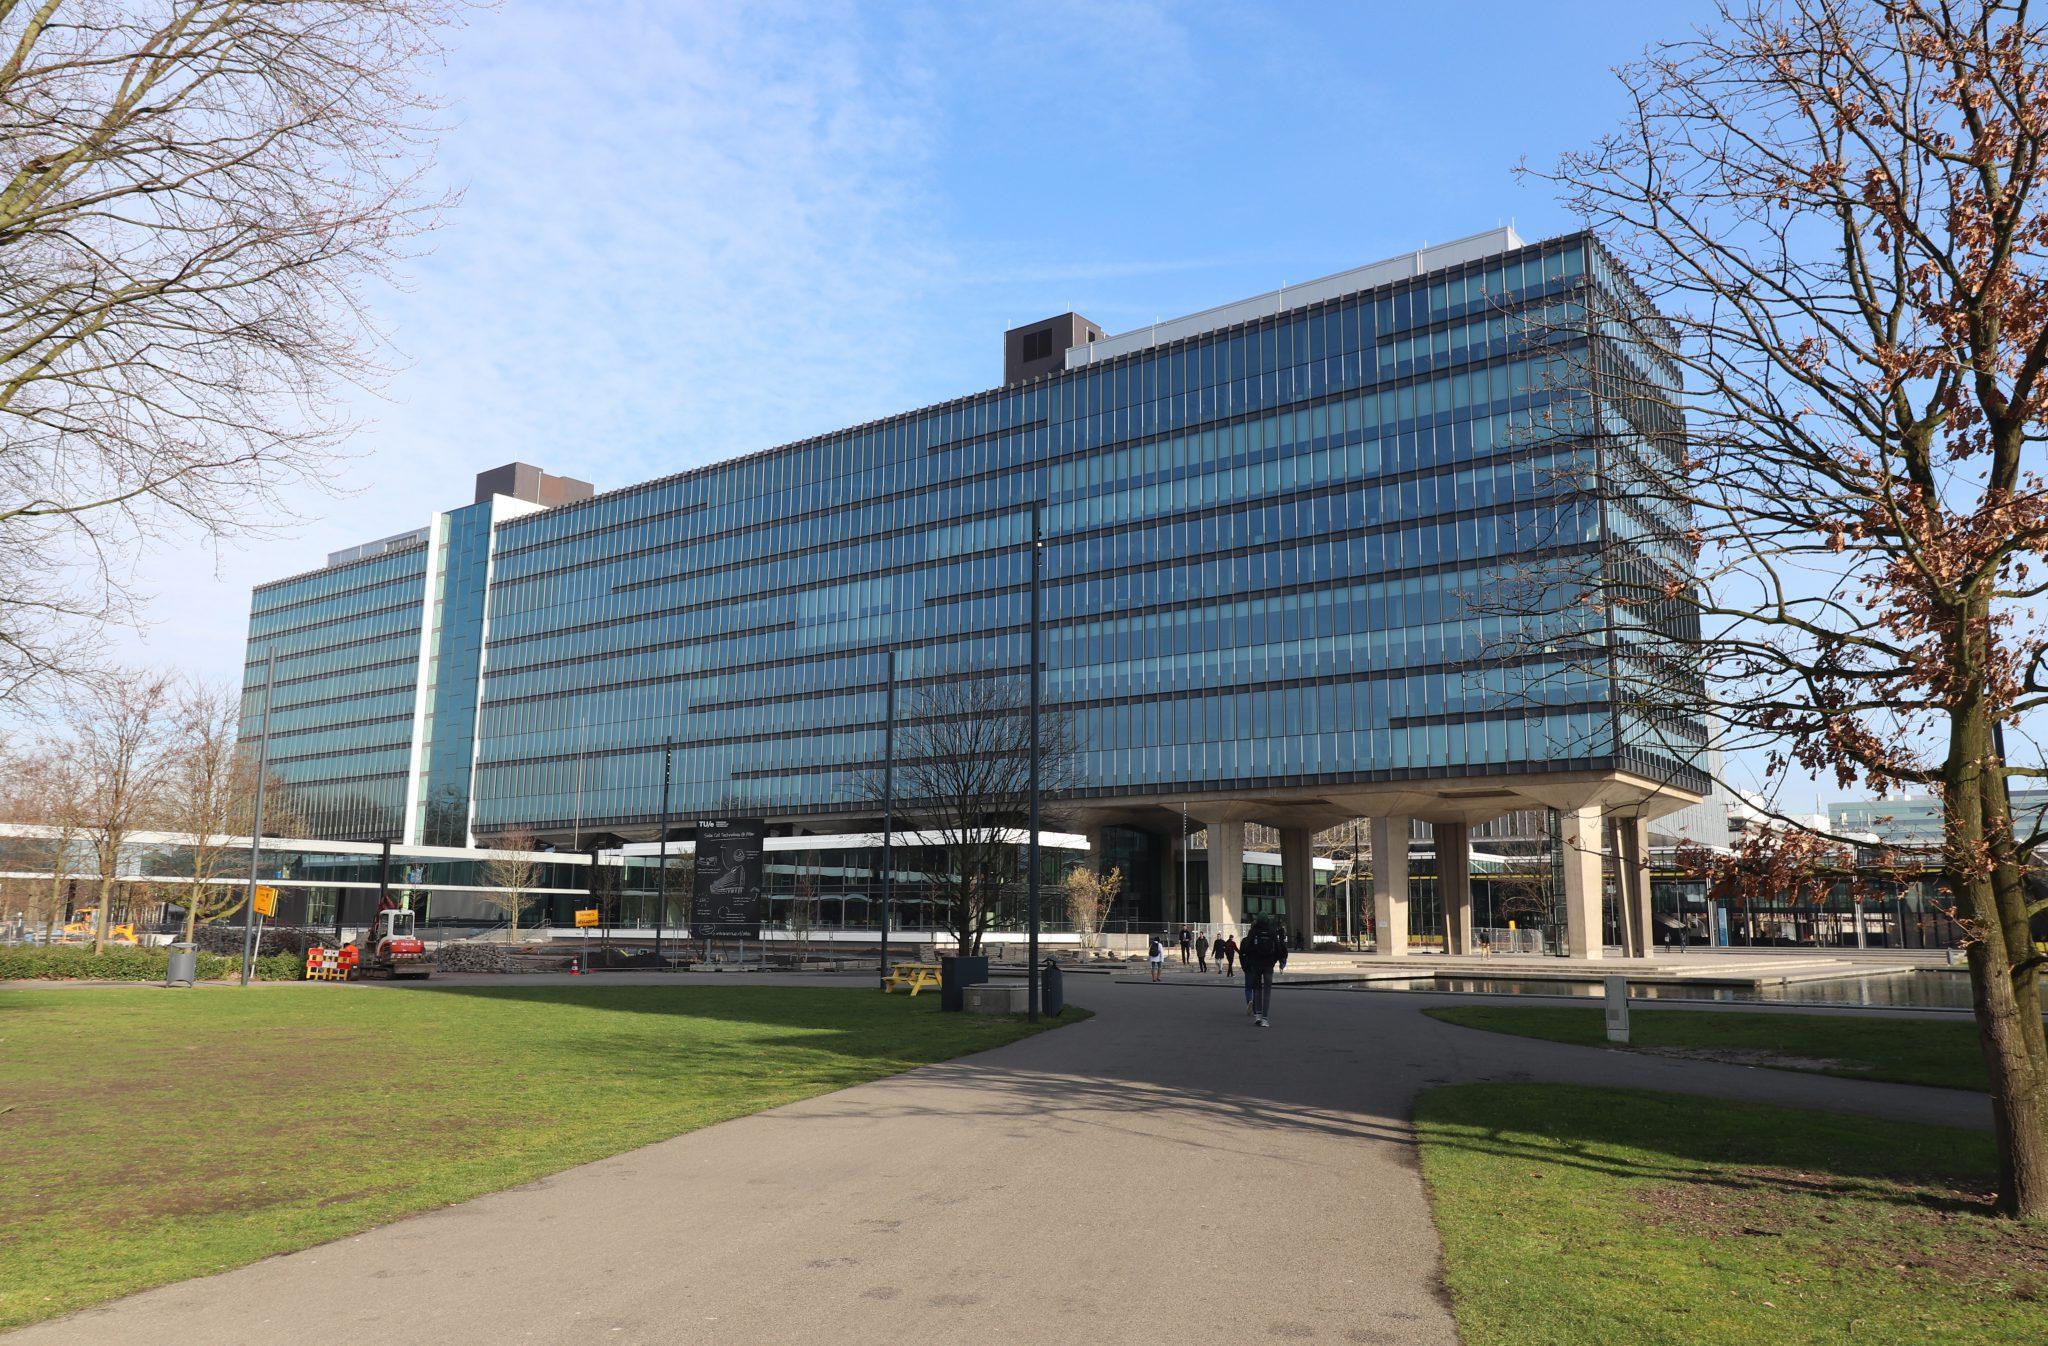 TU/e Eindhoven, atlasgebouw, binnenzonwering, gevel